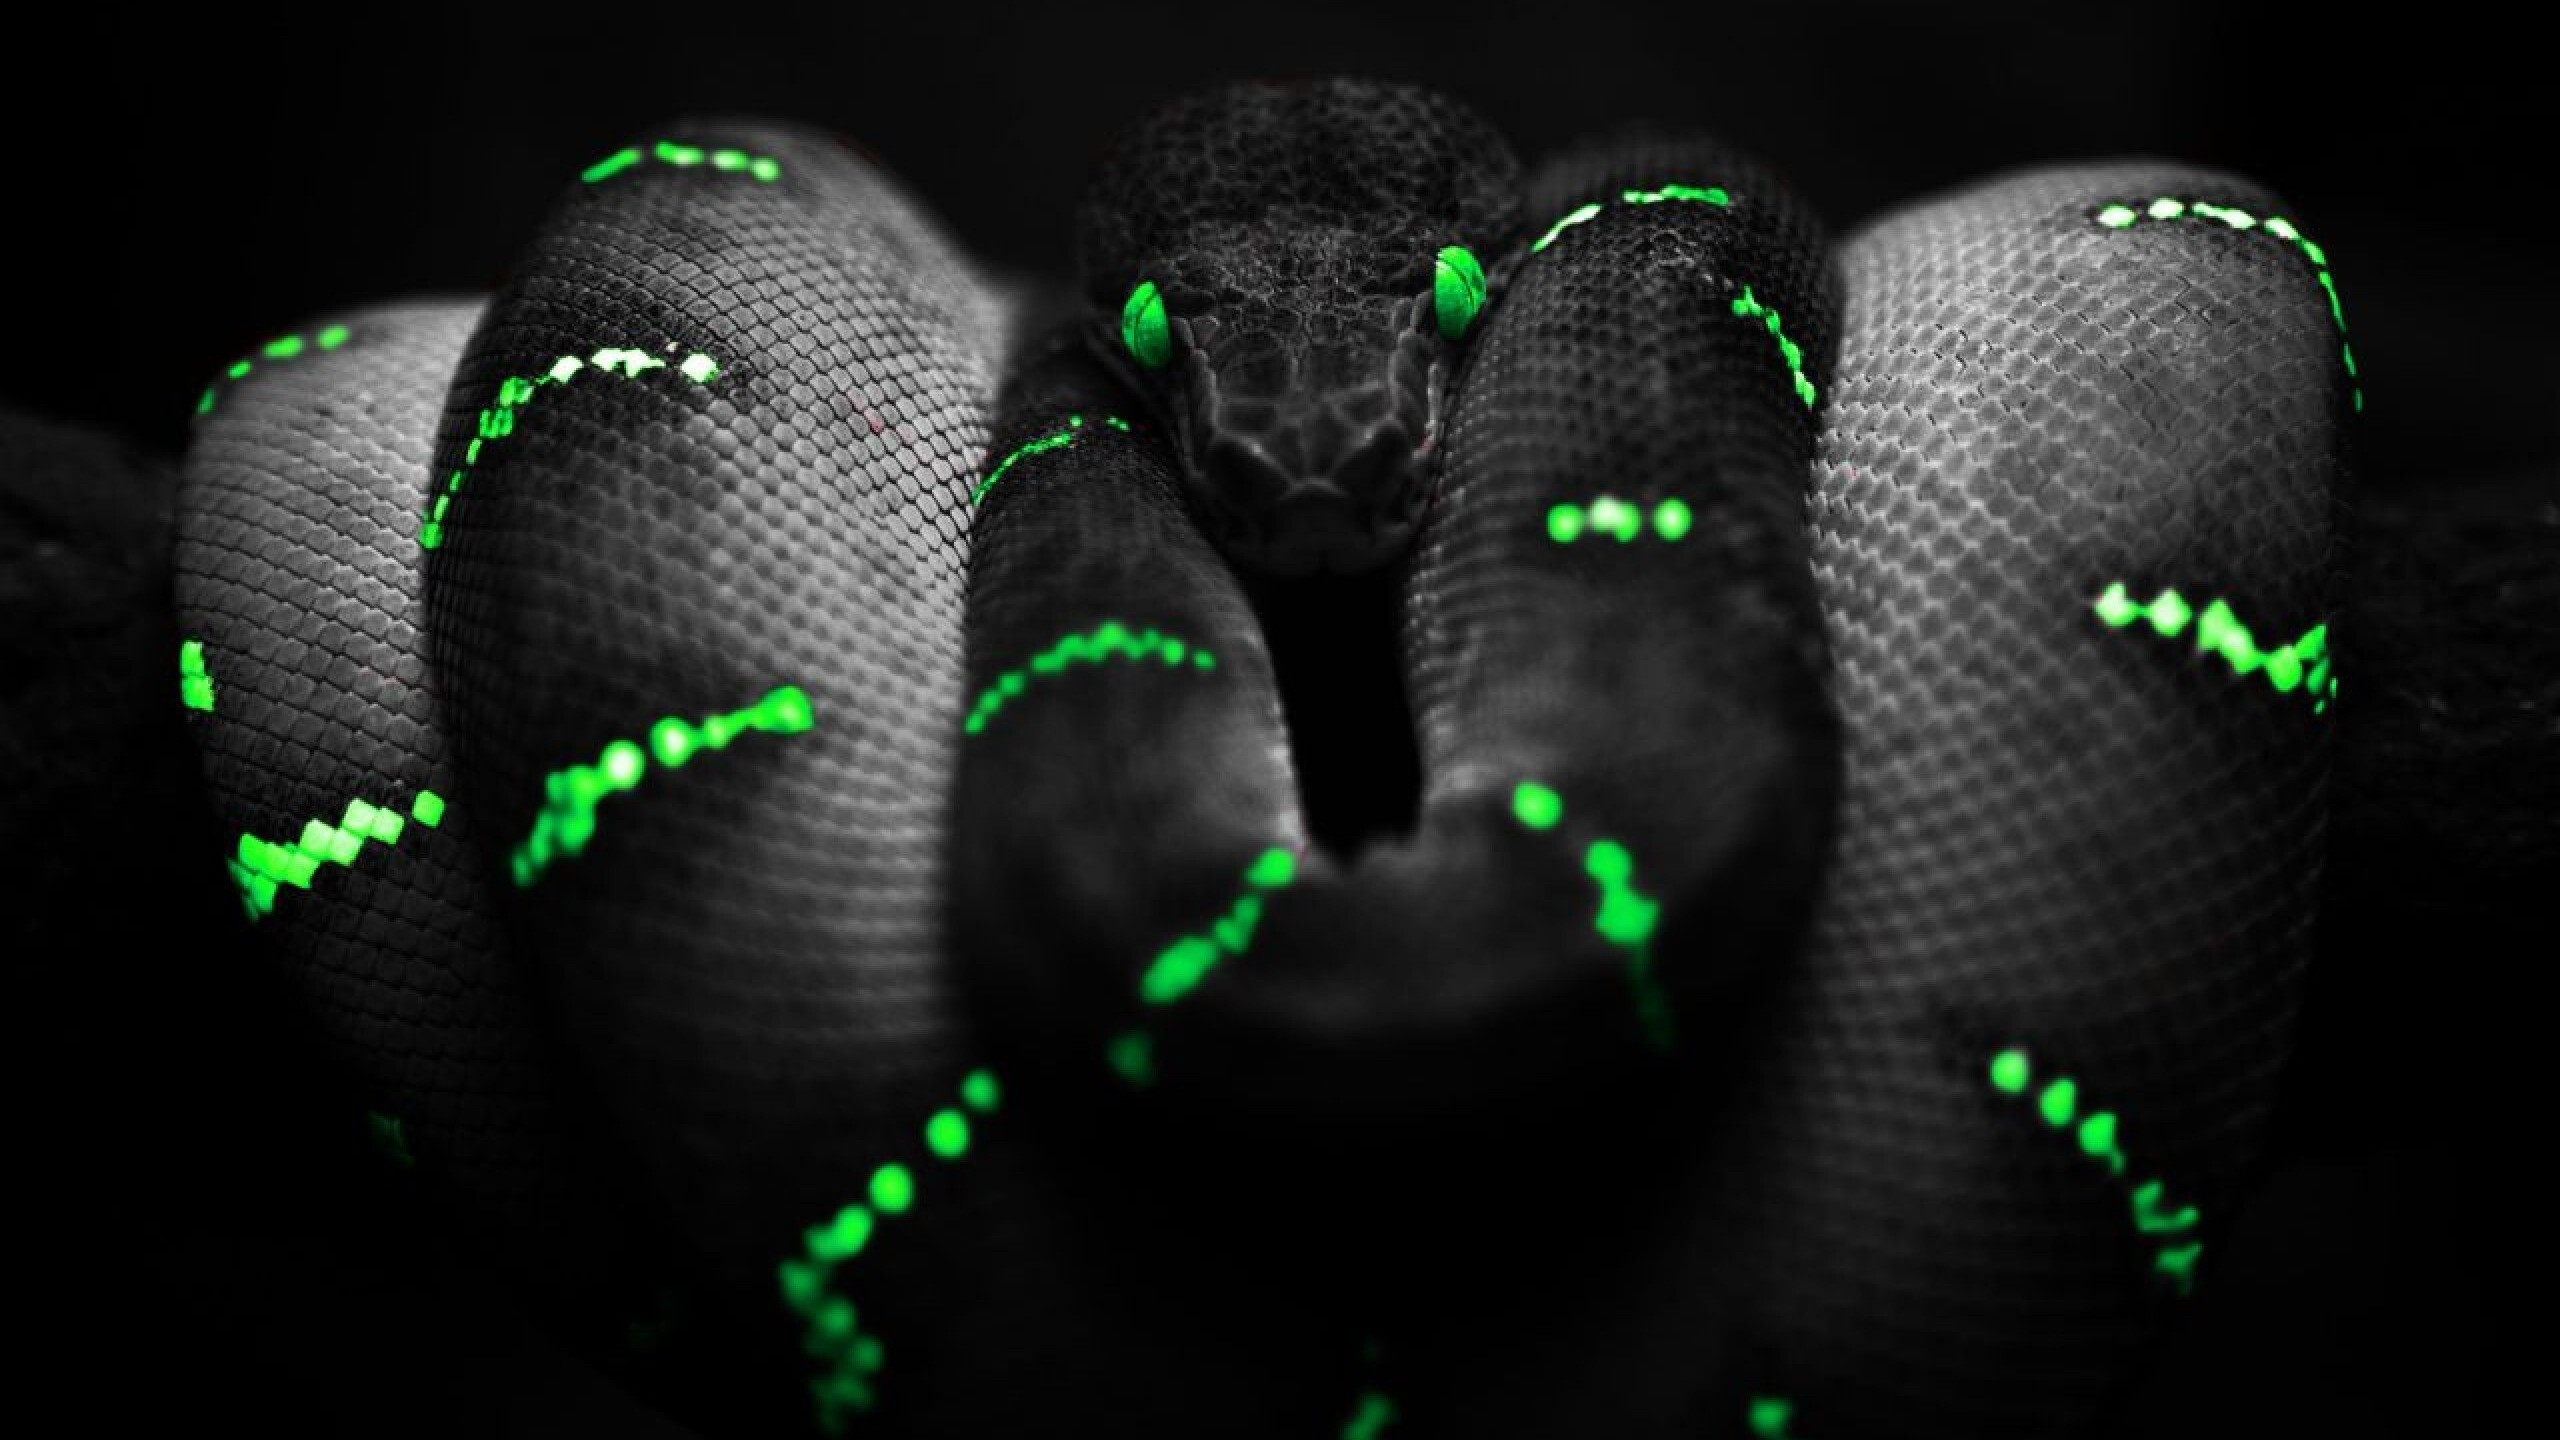 Black Scary Snake Wallpaper Hd Wallpapers